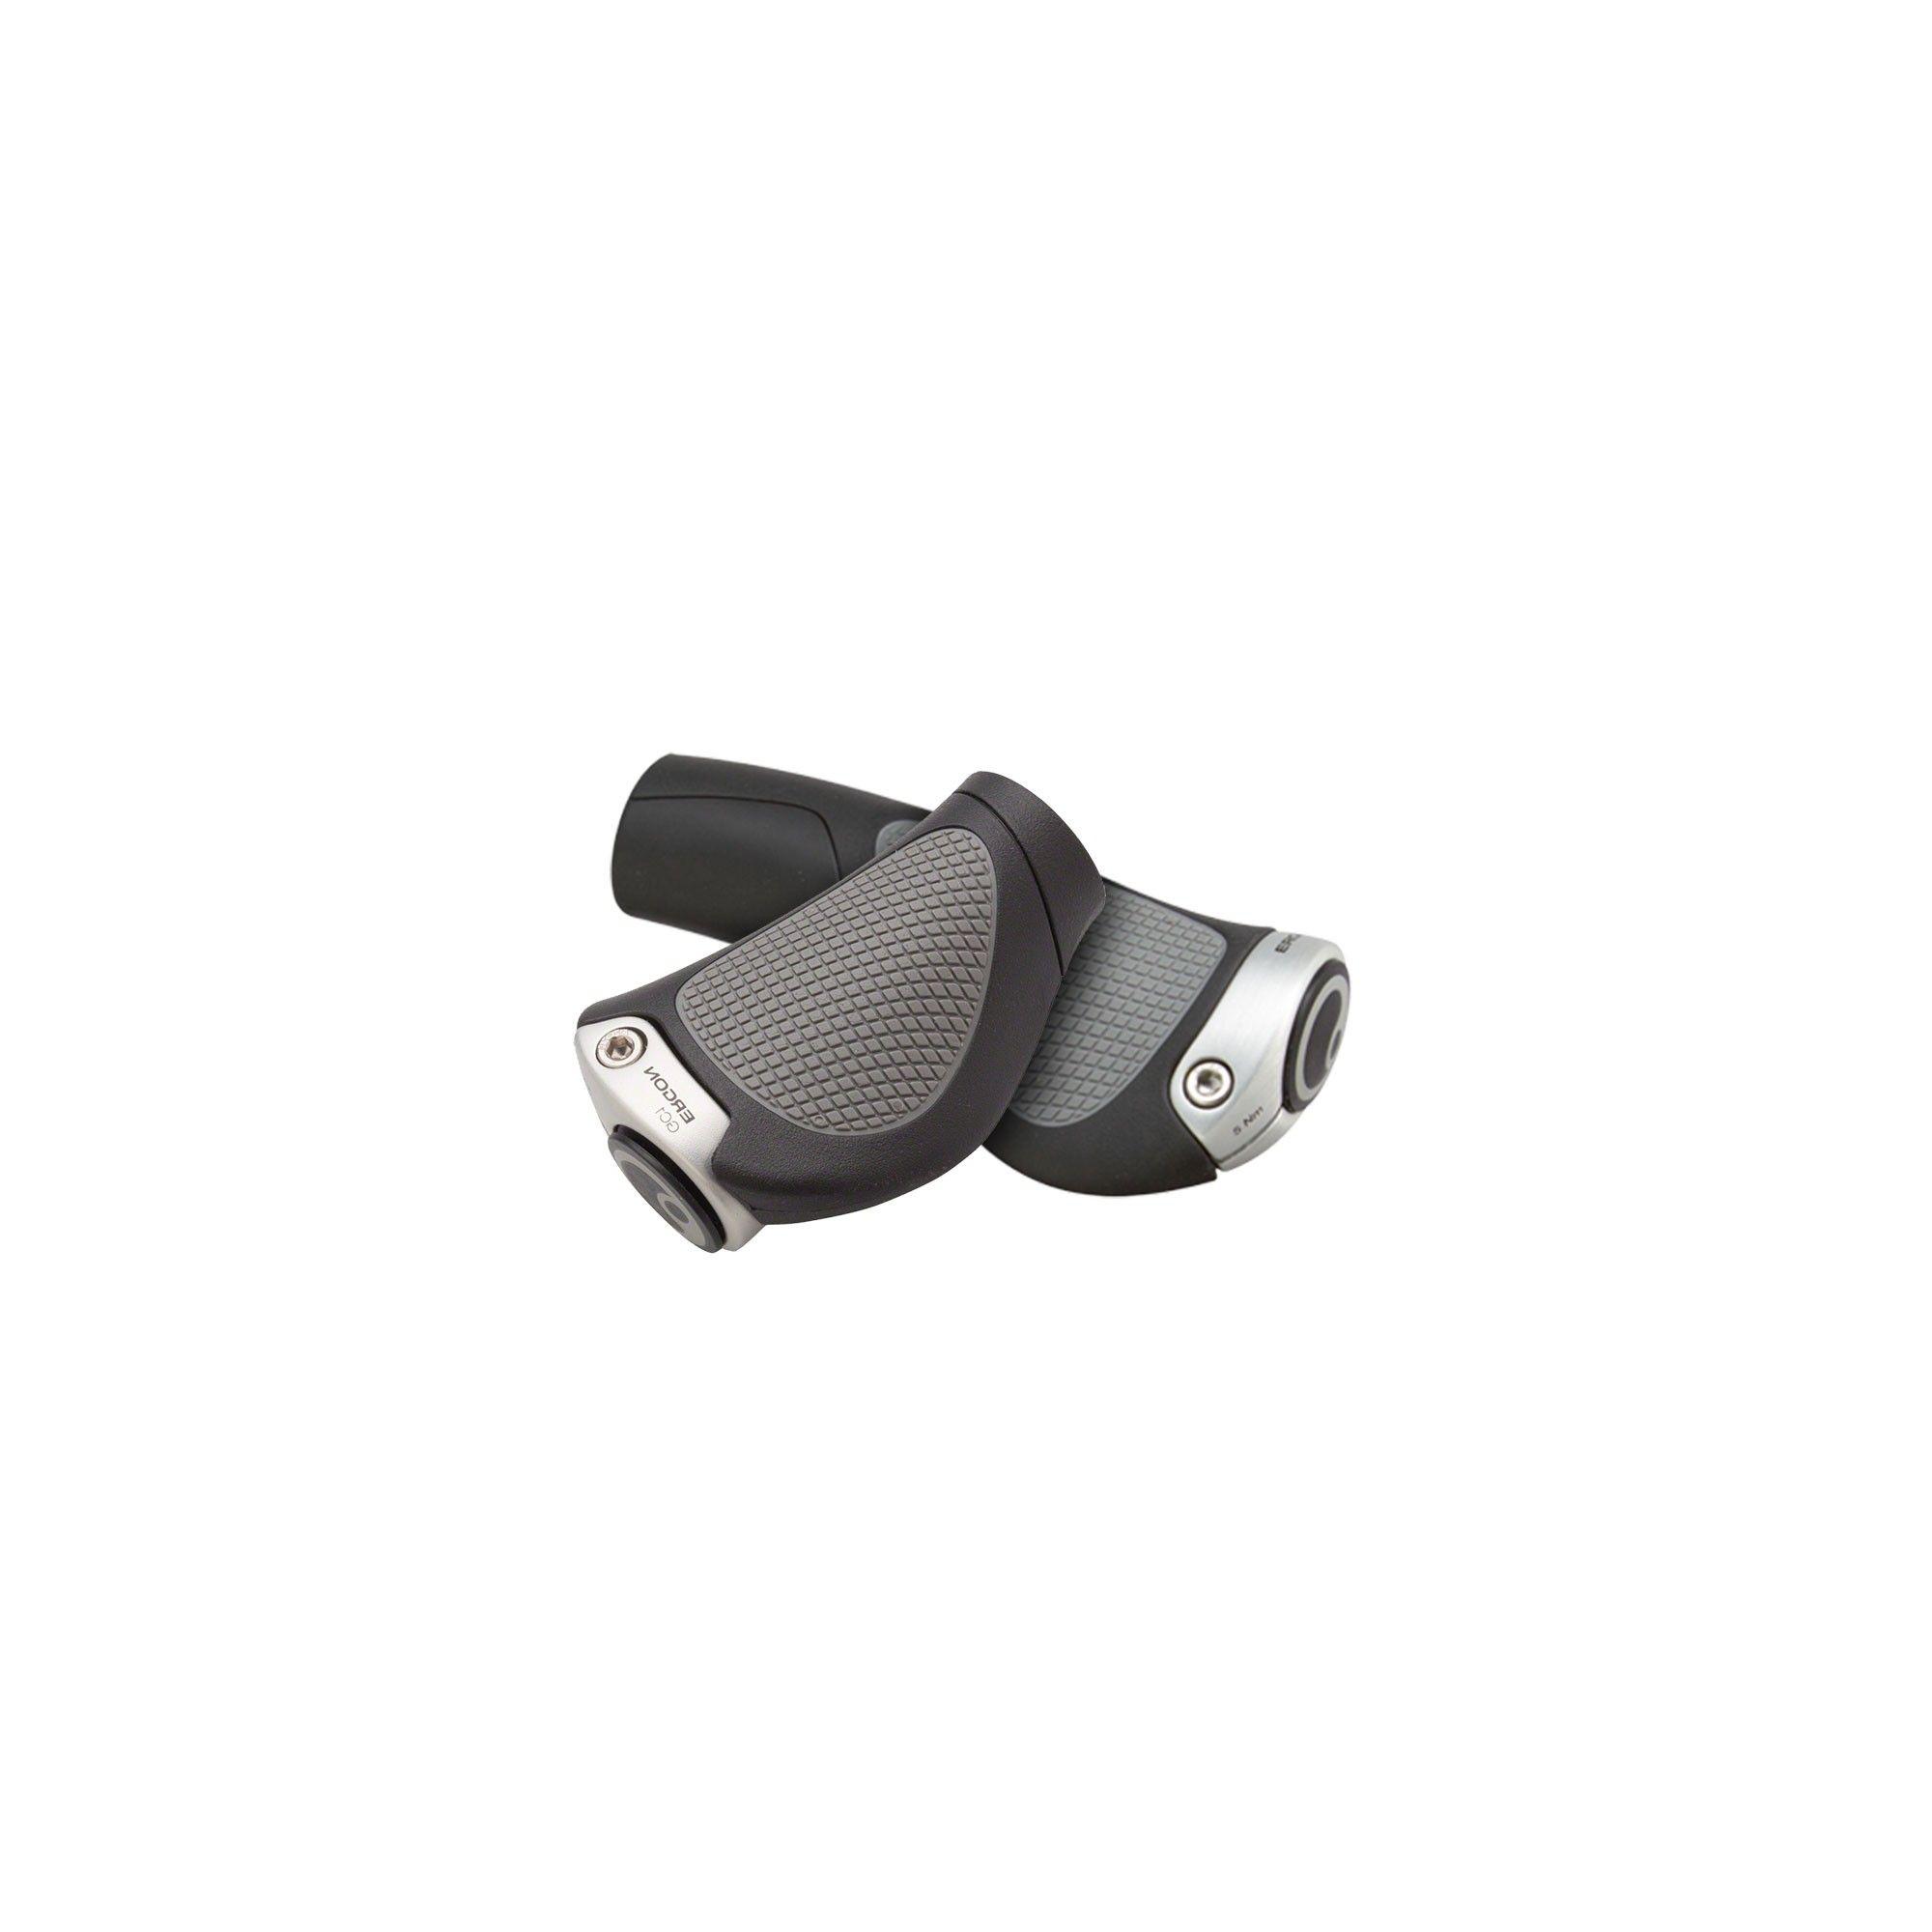 NEW Ergon GC1 Grips Black//Gray